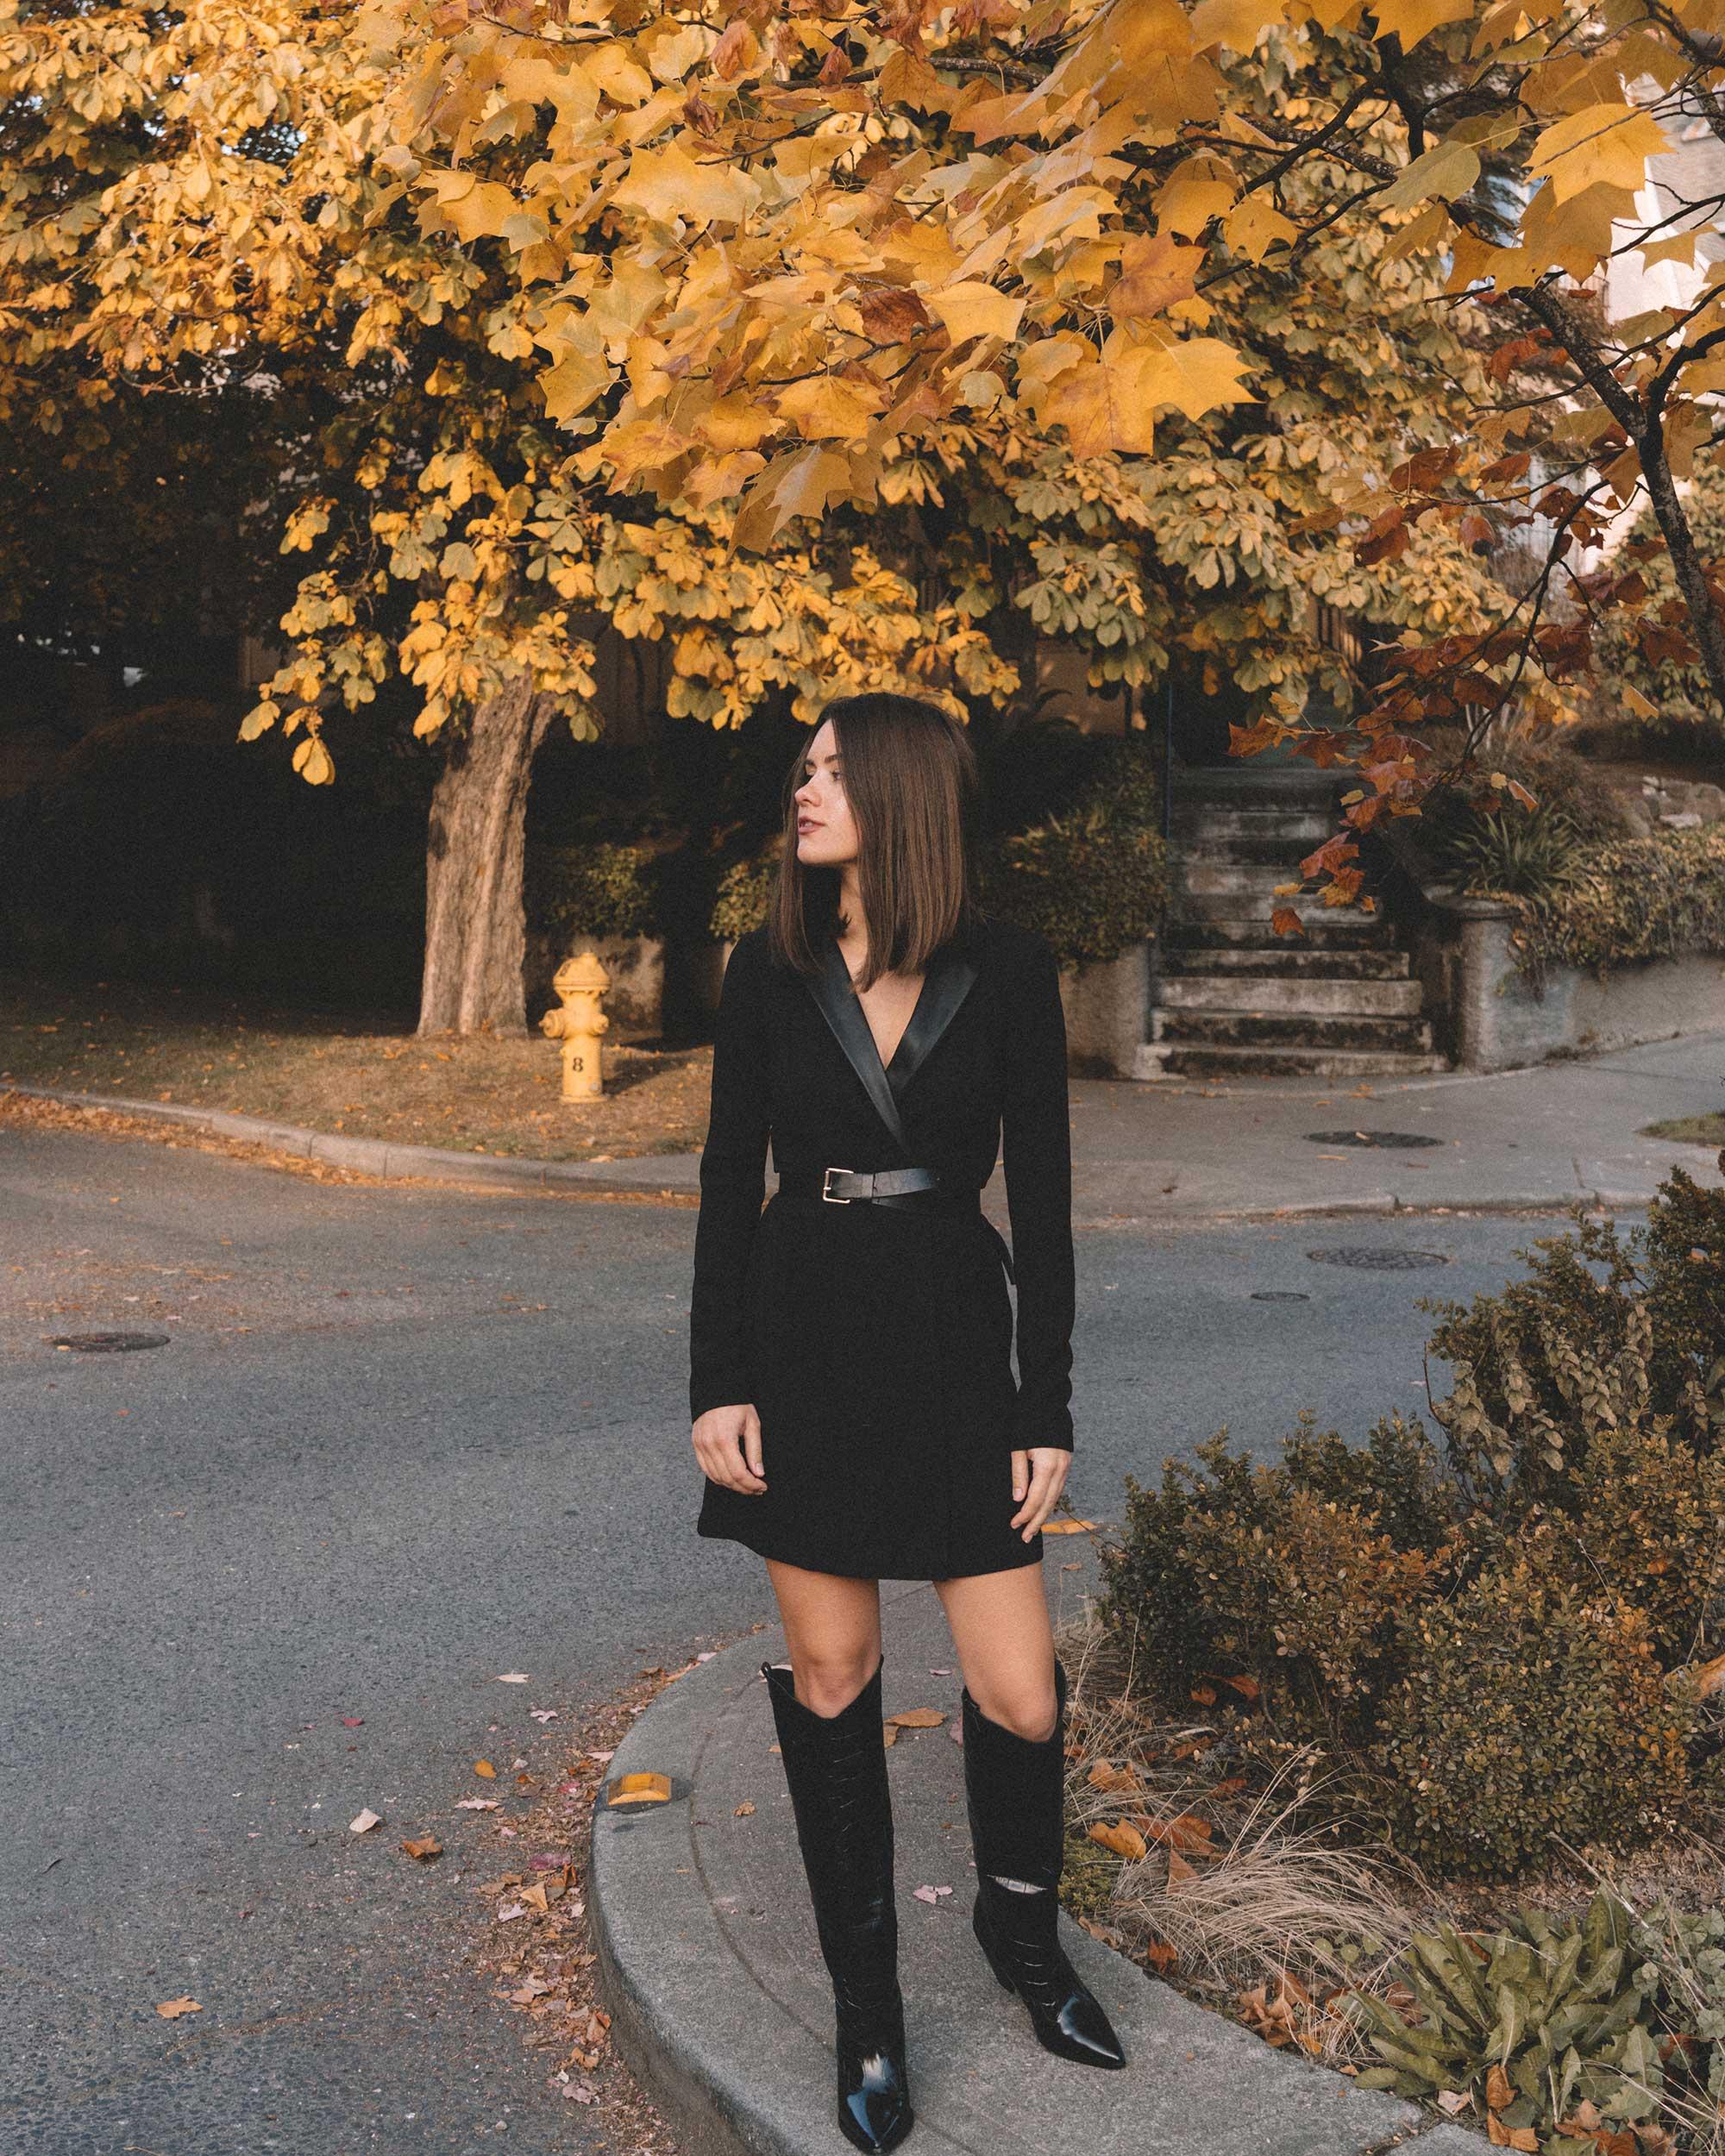 bcbgeneration blazer dress in black, Sigerson Morrison Karida Black Leather Knee High Boot, fall outfit 1.jpg